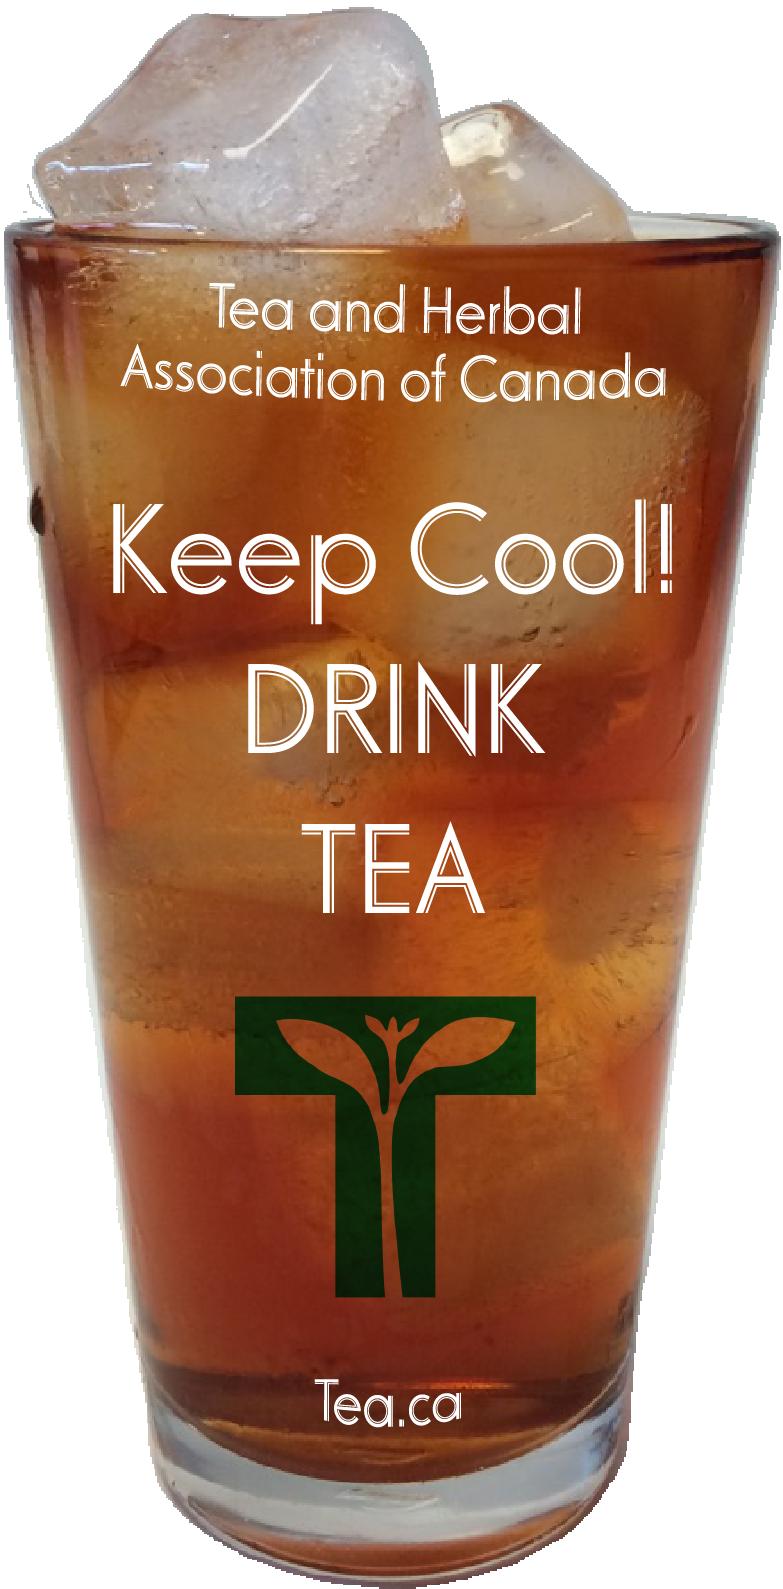 Keep Cool! Drink Tea!